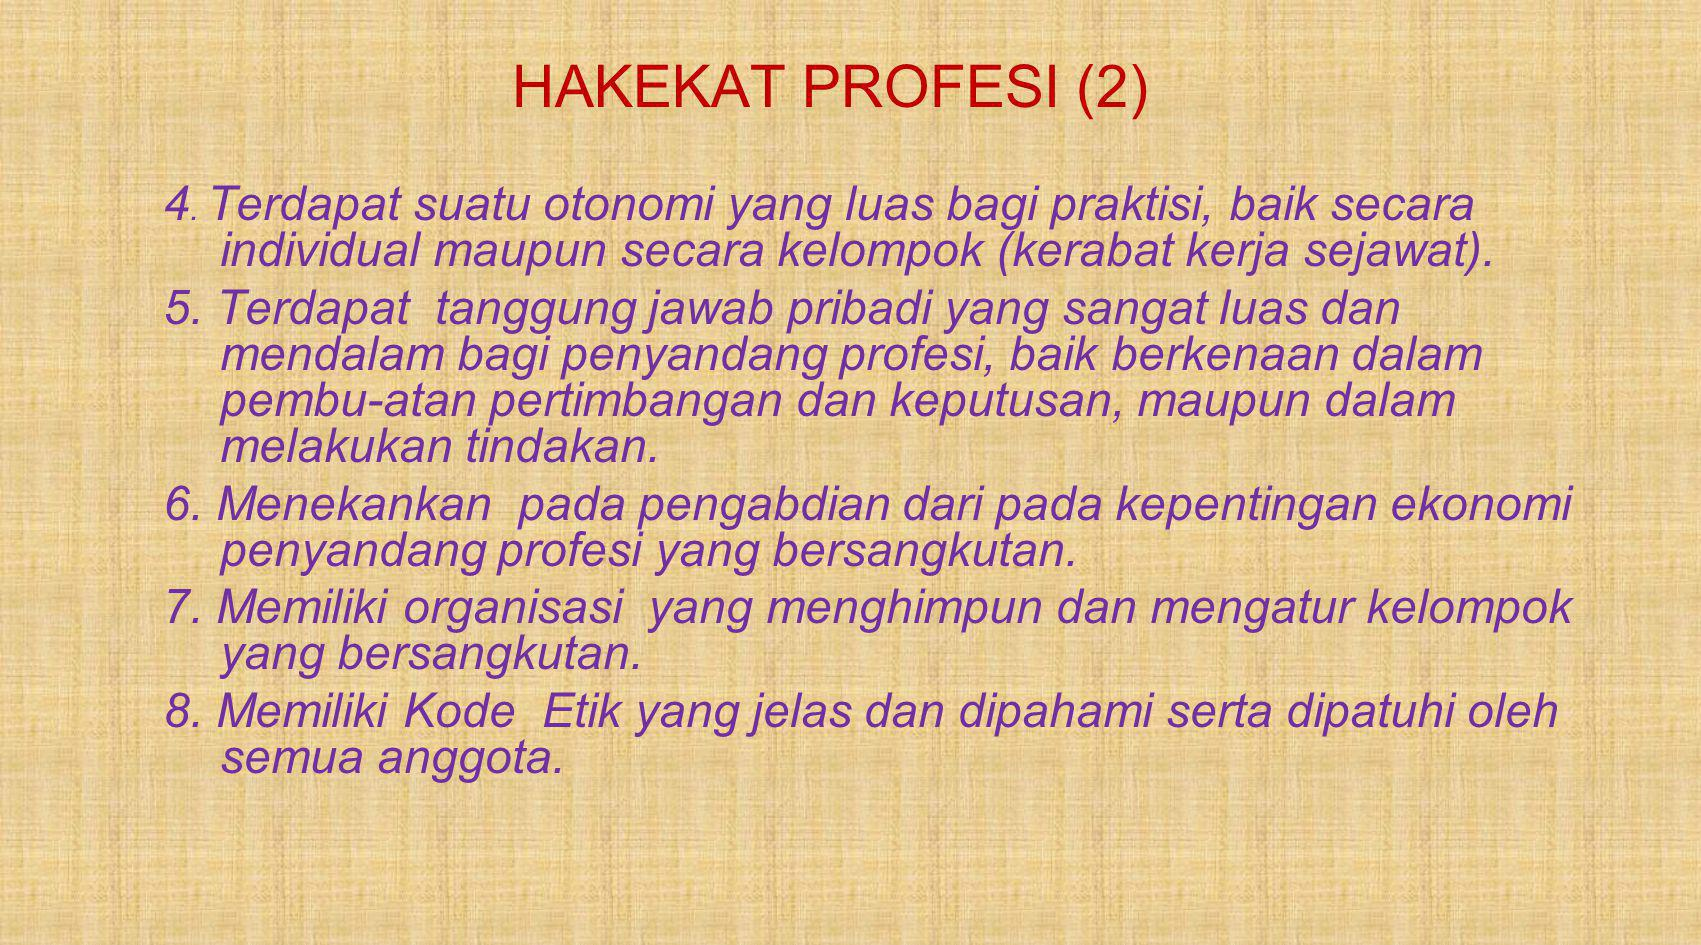 HAKEKAT PROFESI (2) 4. Terdapat suatu otonomi yang luas bagi praktisi, baik secara individual maupun secara kelompok (kerabat kerja sejawat).